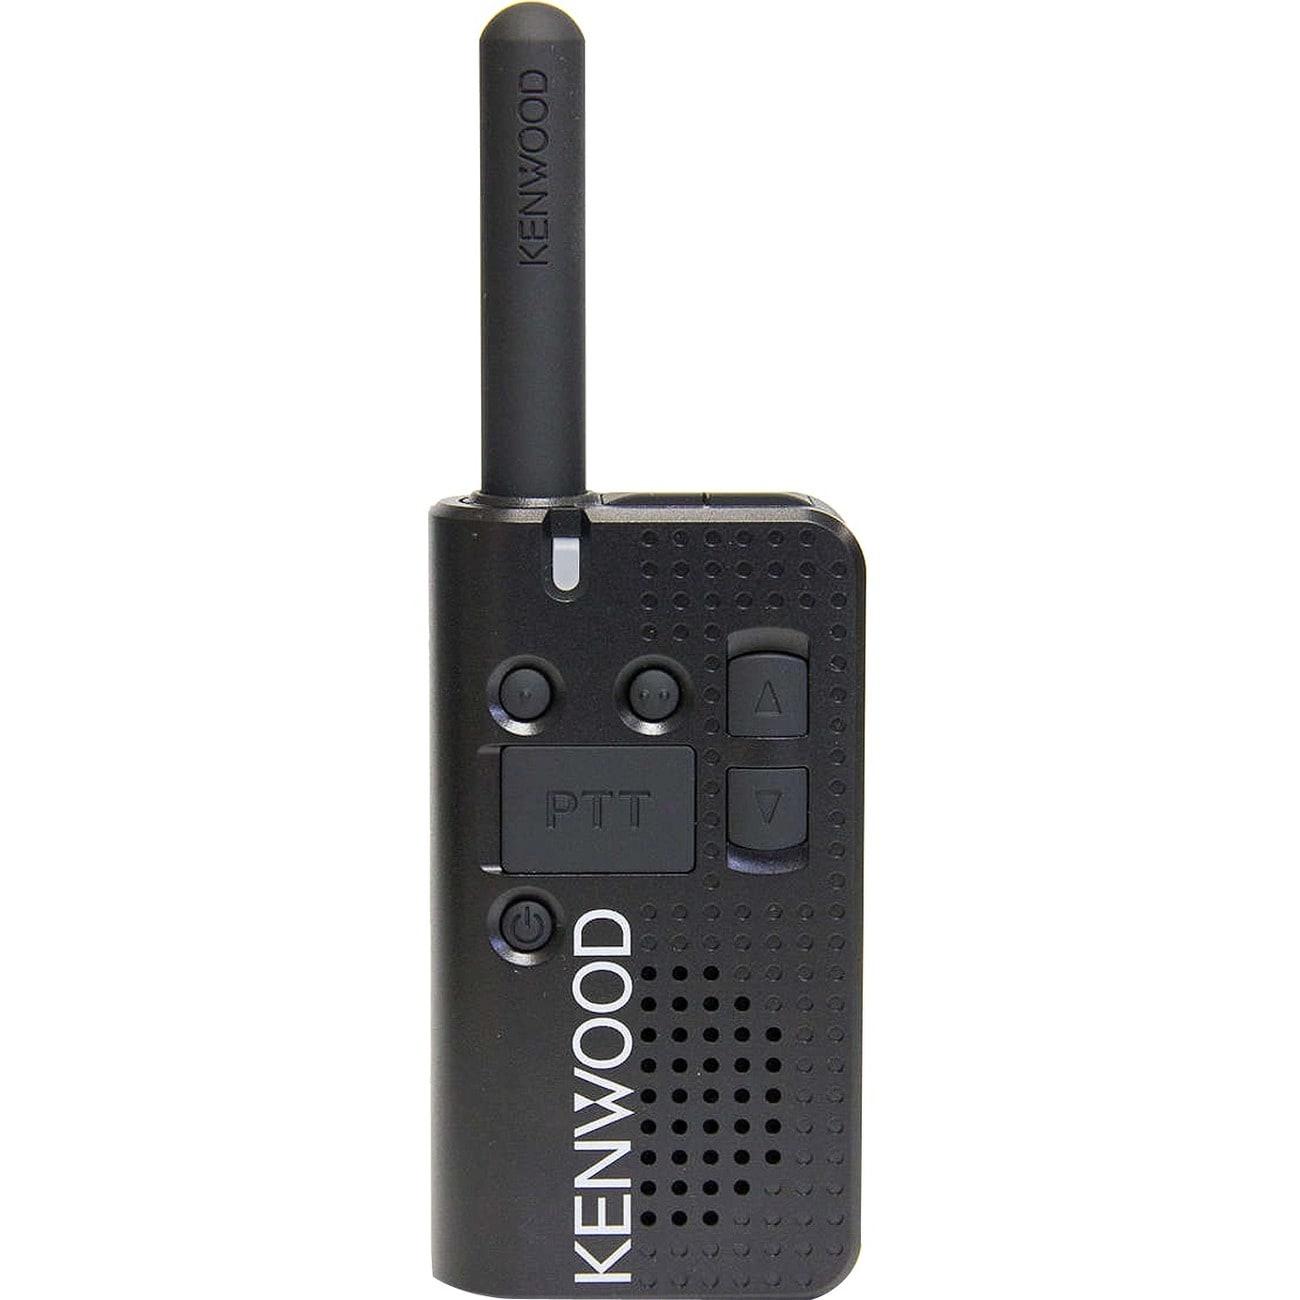 Wearable 1.5 Watt Industrial Radio - Comparable to Motorola CLS1110/C